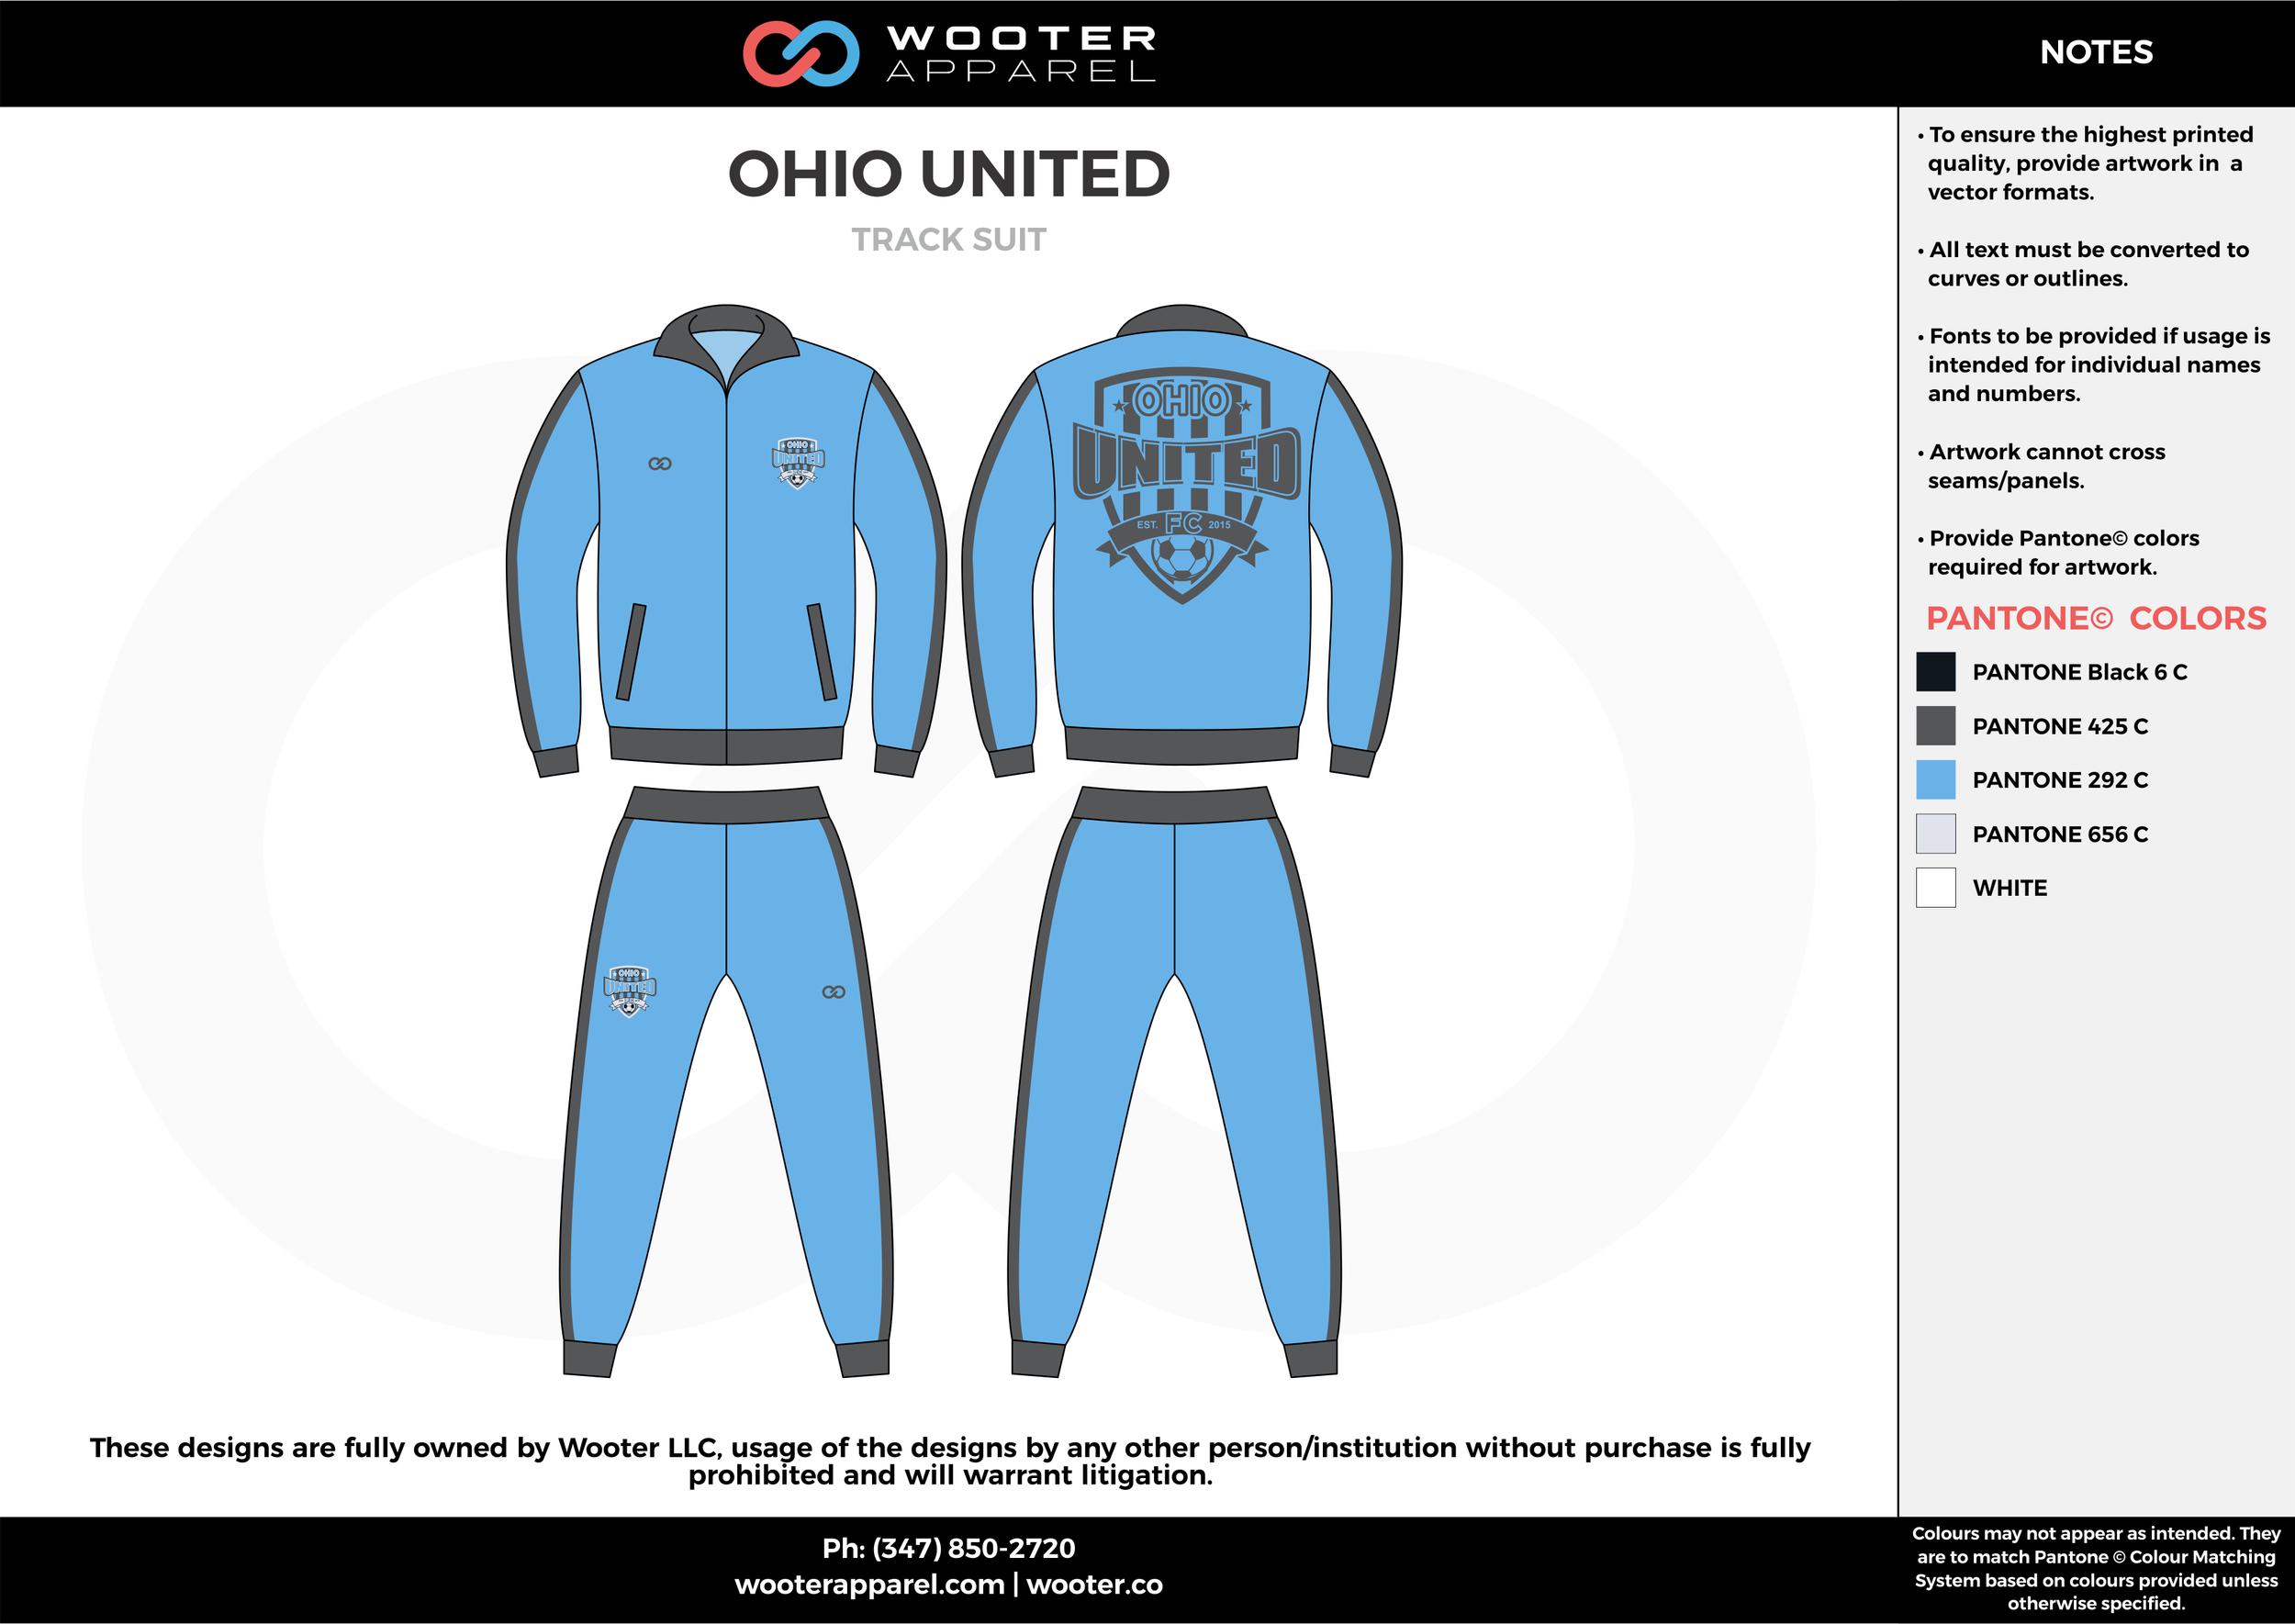 OHIO UNITED blue gray custom sublimated soccer uniform jersey track suit